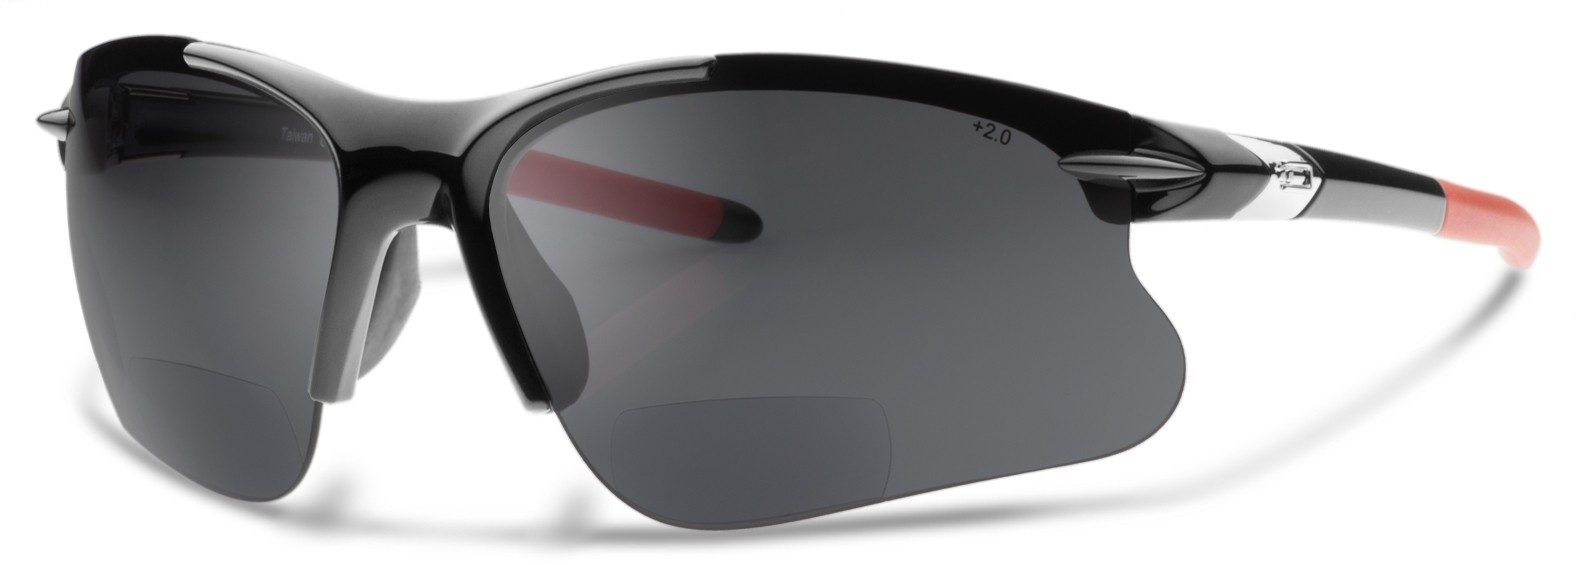 SL2 Pro X